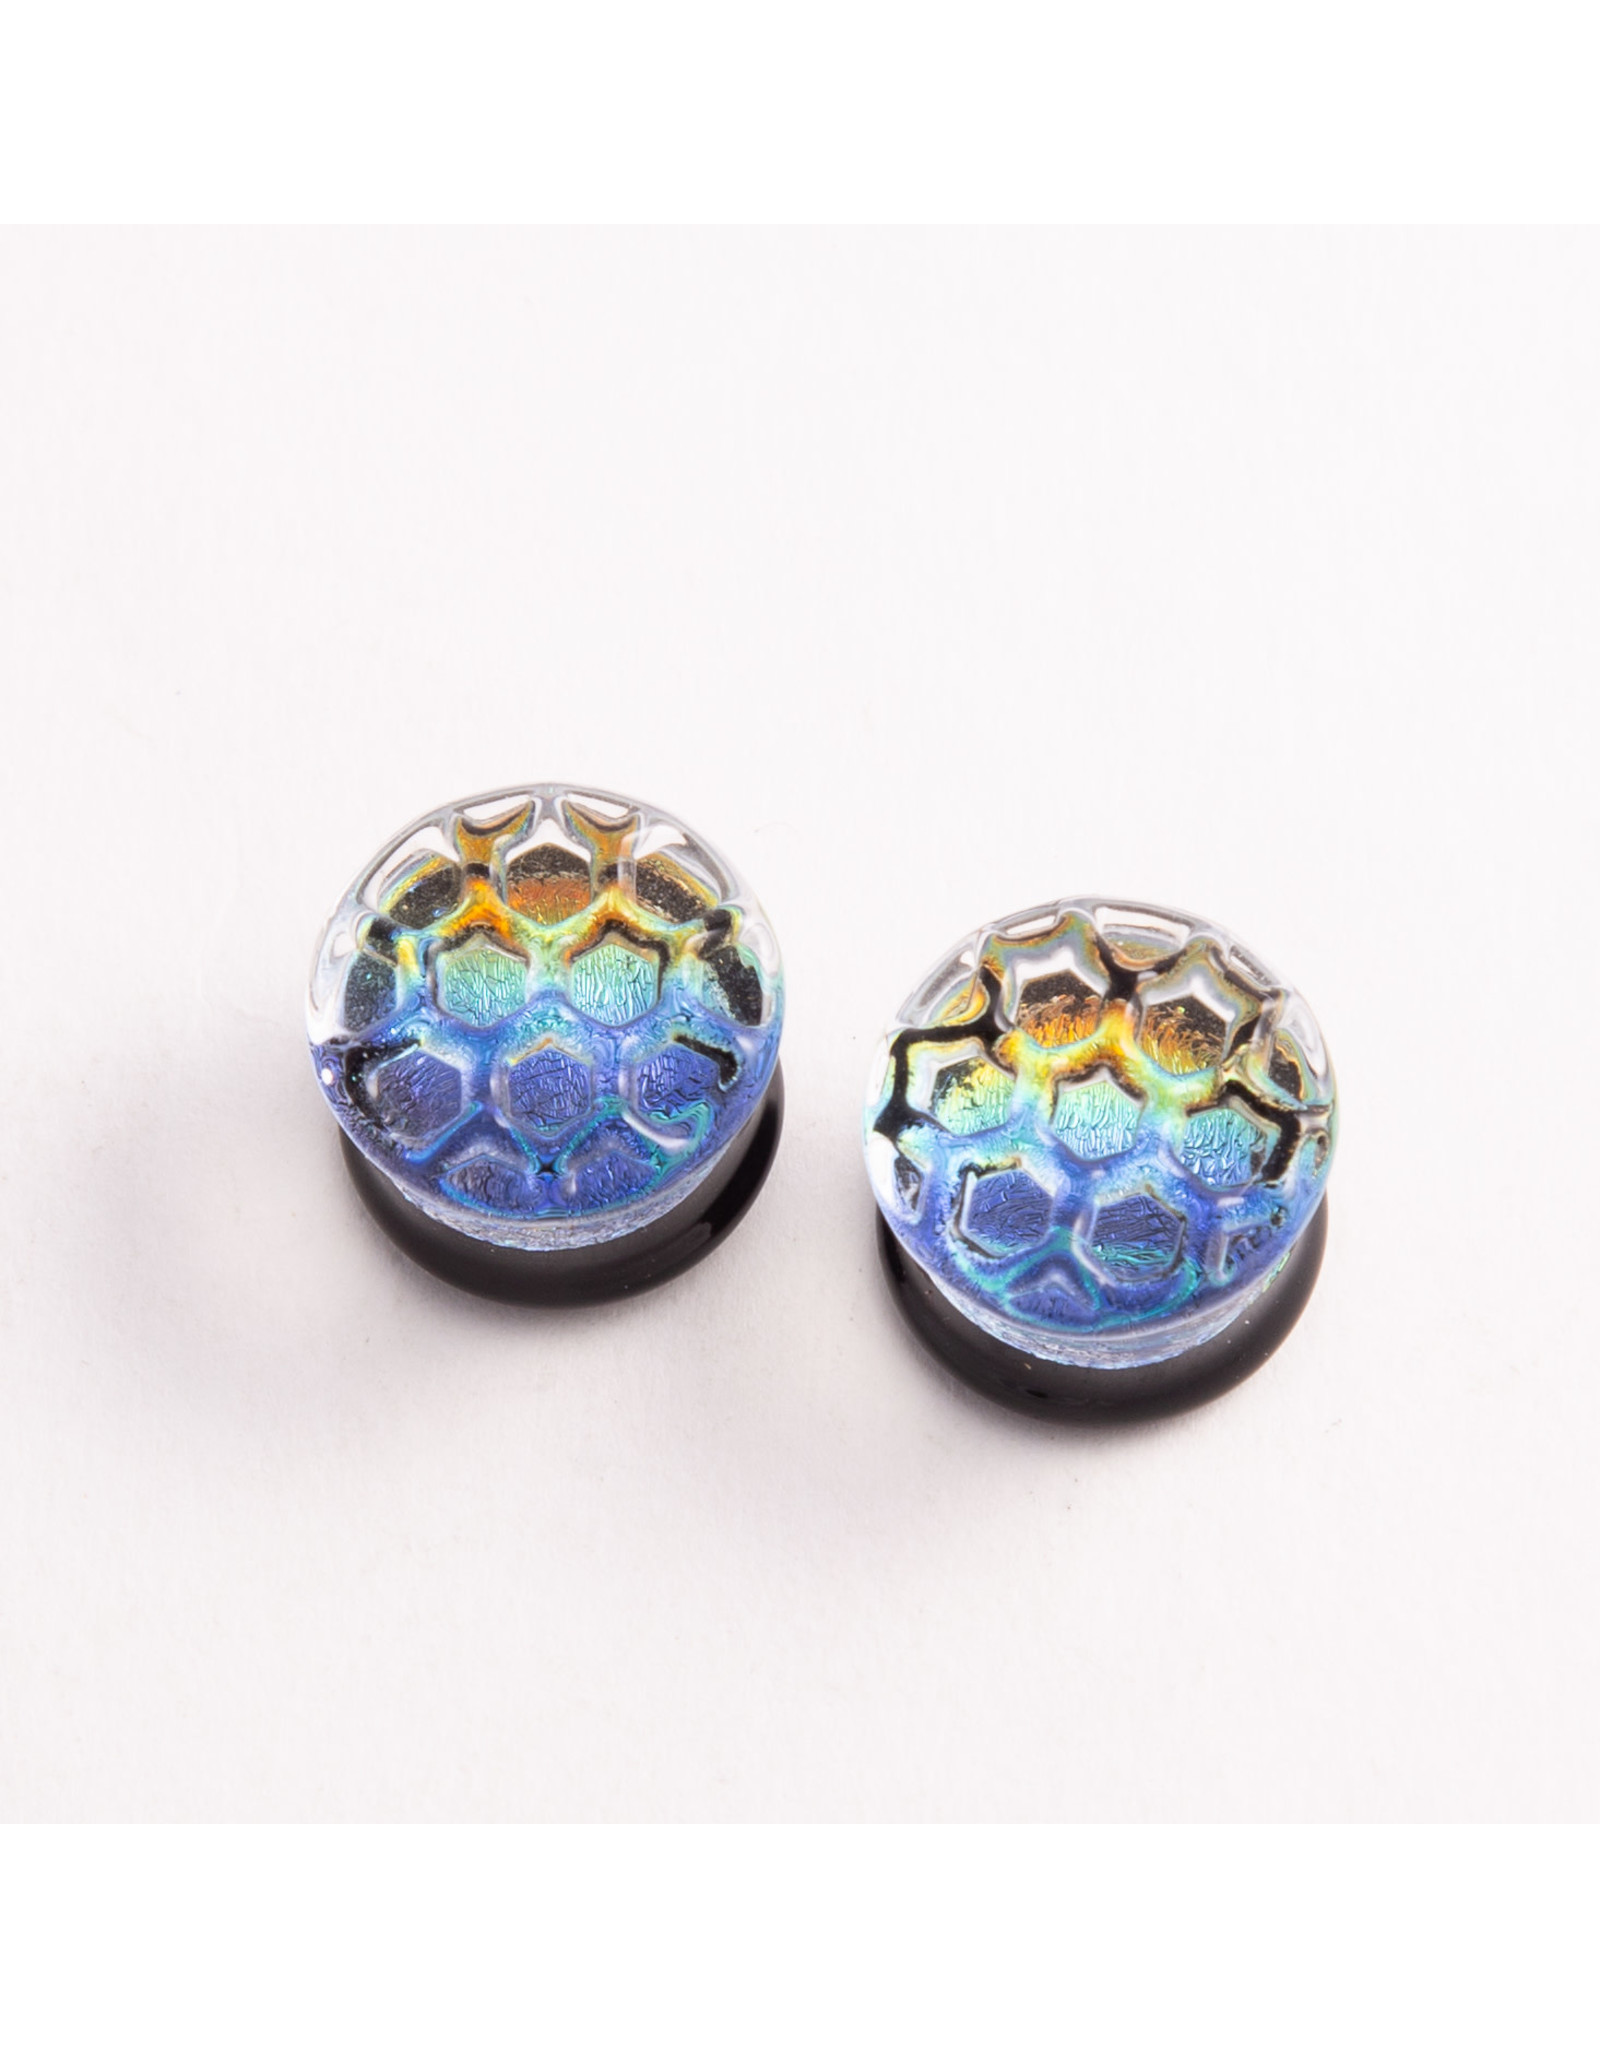 Glasswear studios Glasswear Studios 5/8 rainbow foil with honeycomb texture double flare plug